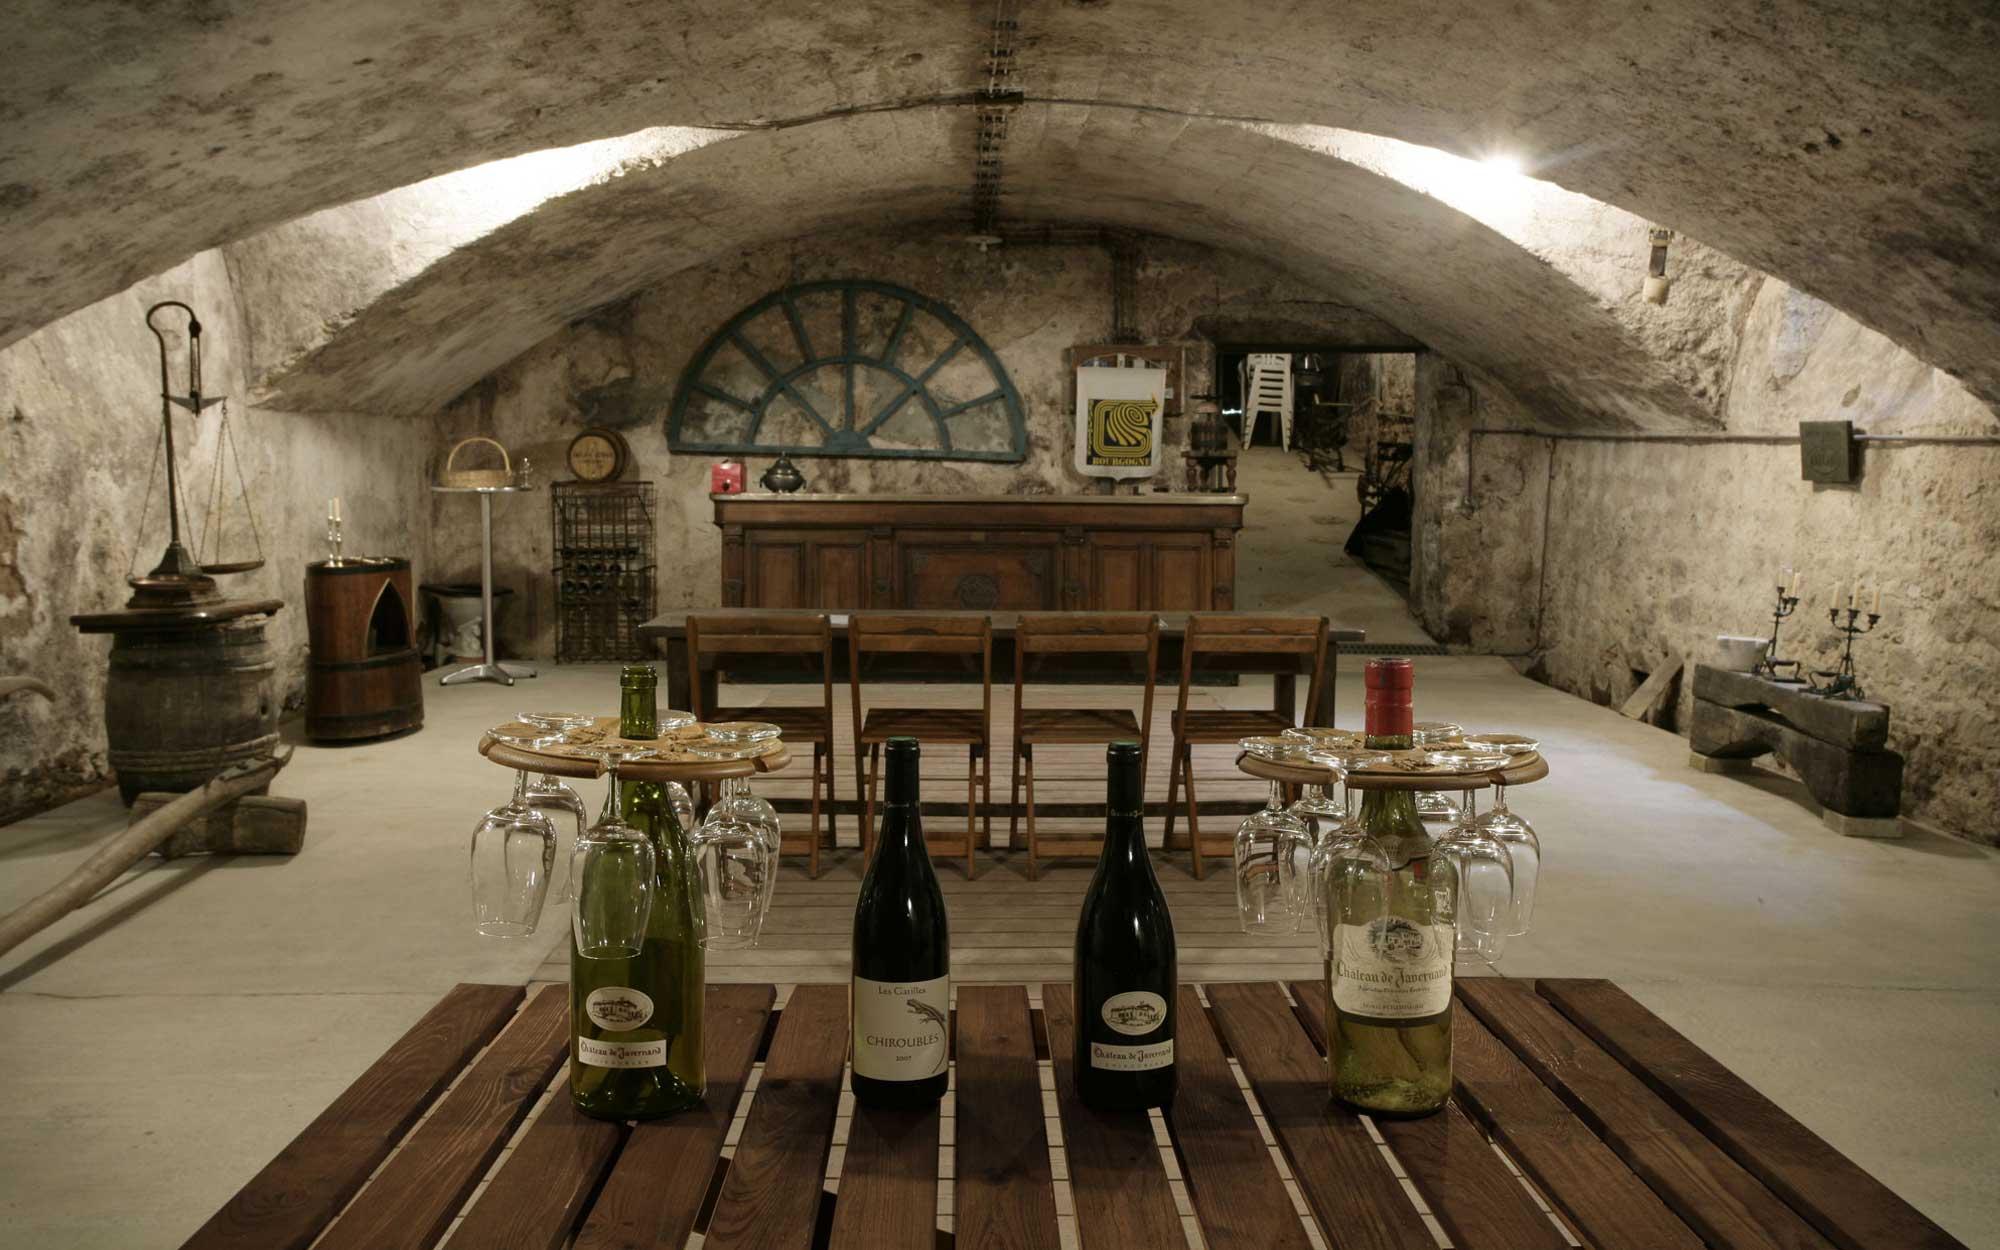 French wine_Beaujolais _8